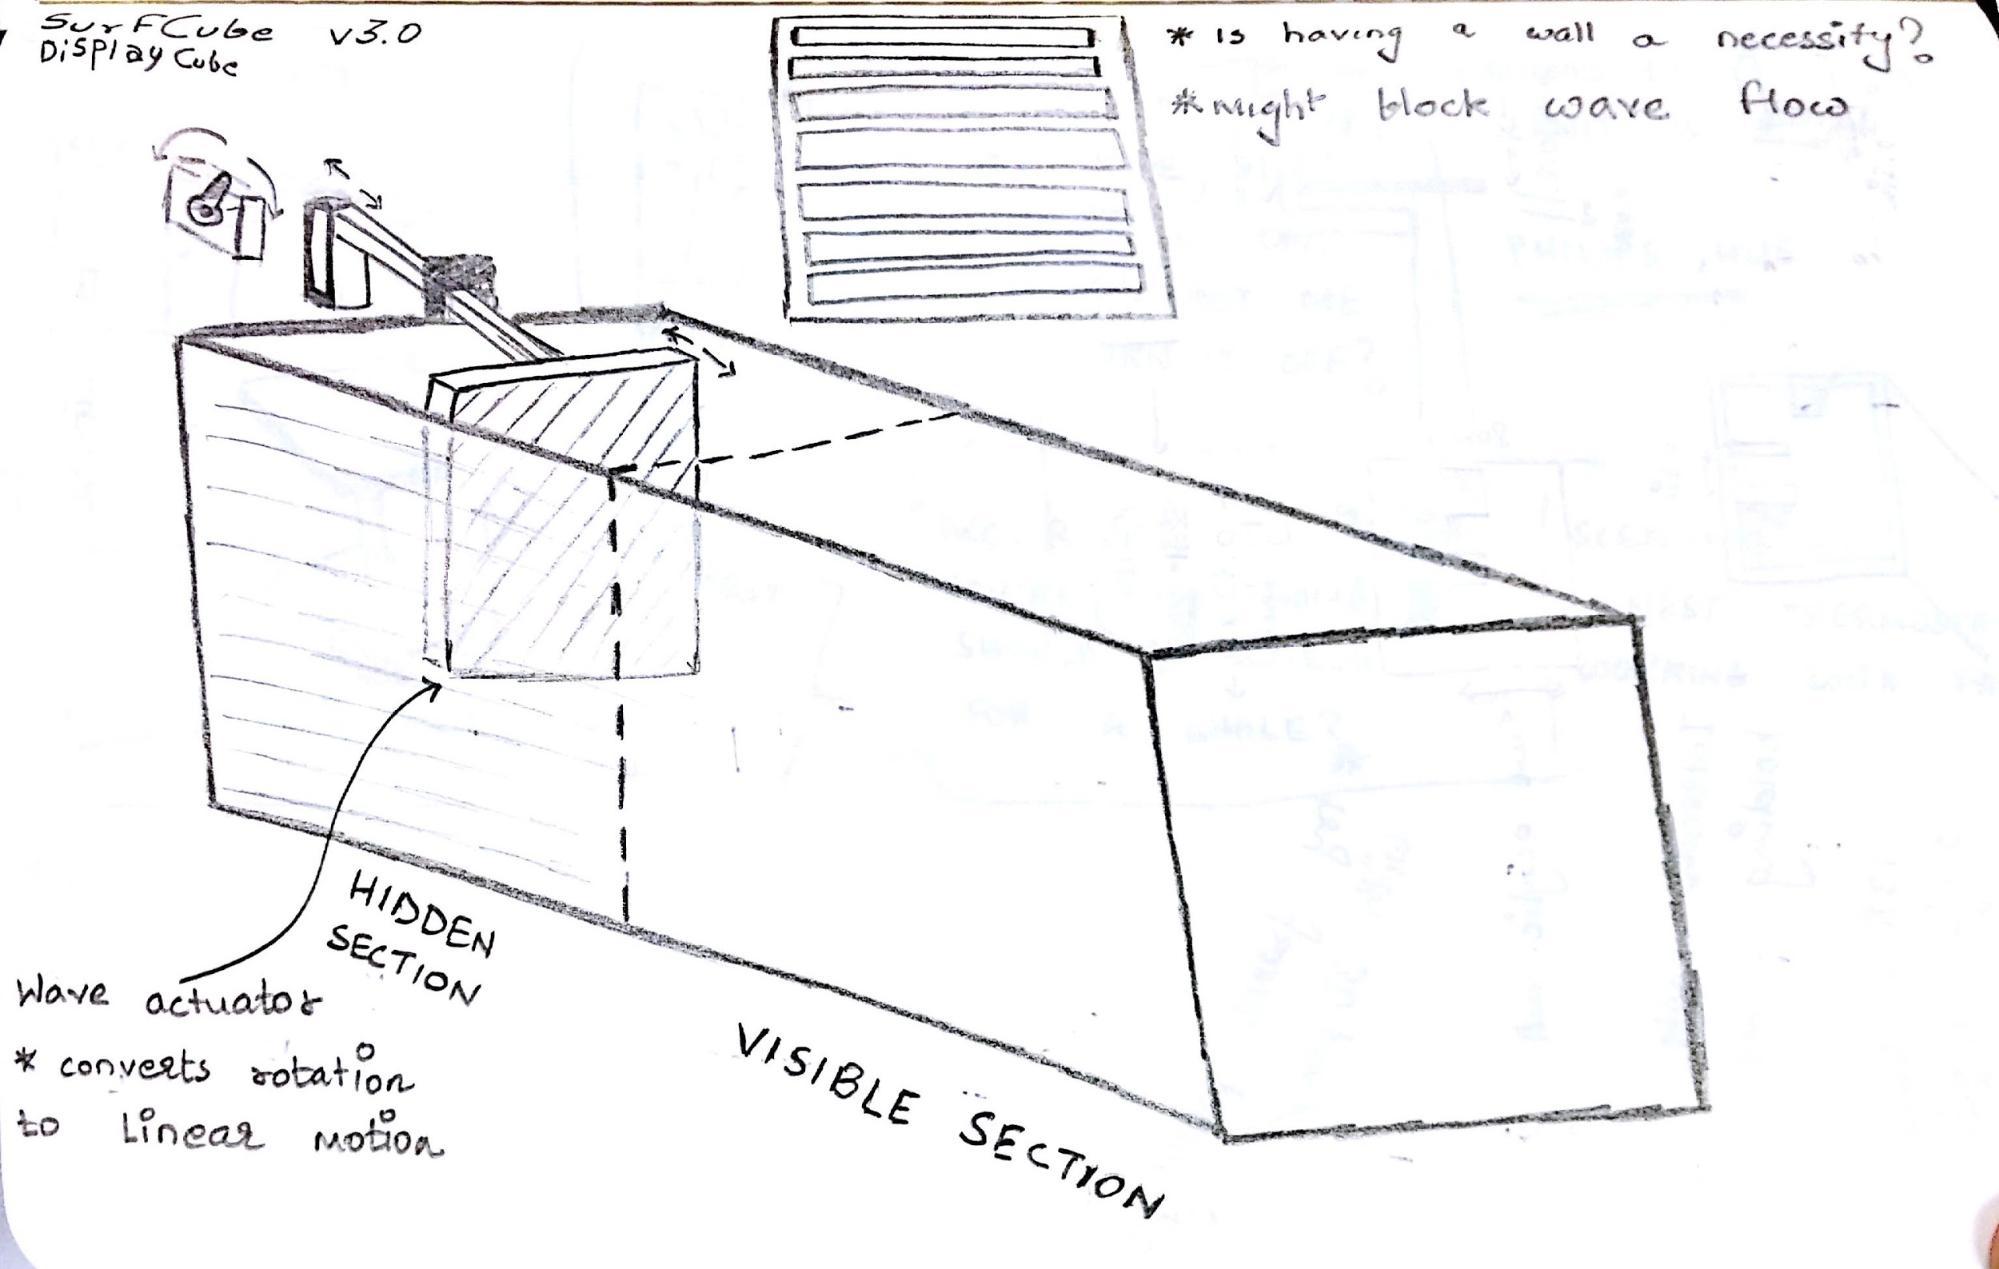 SurfCube Sketch